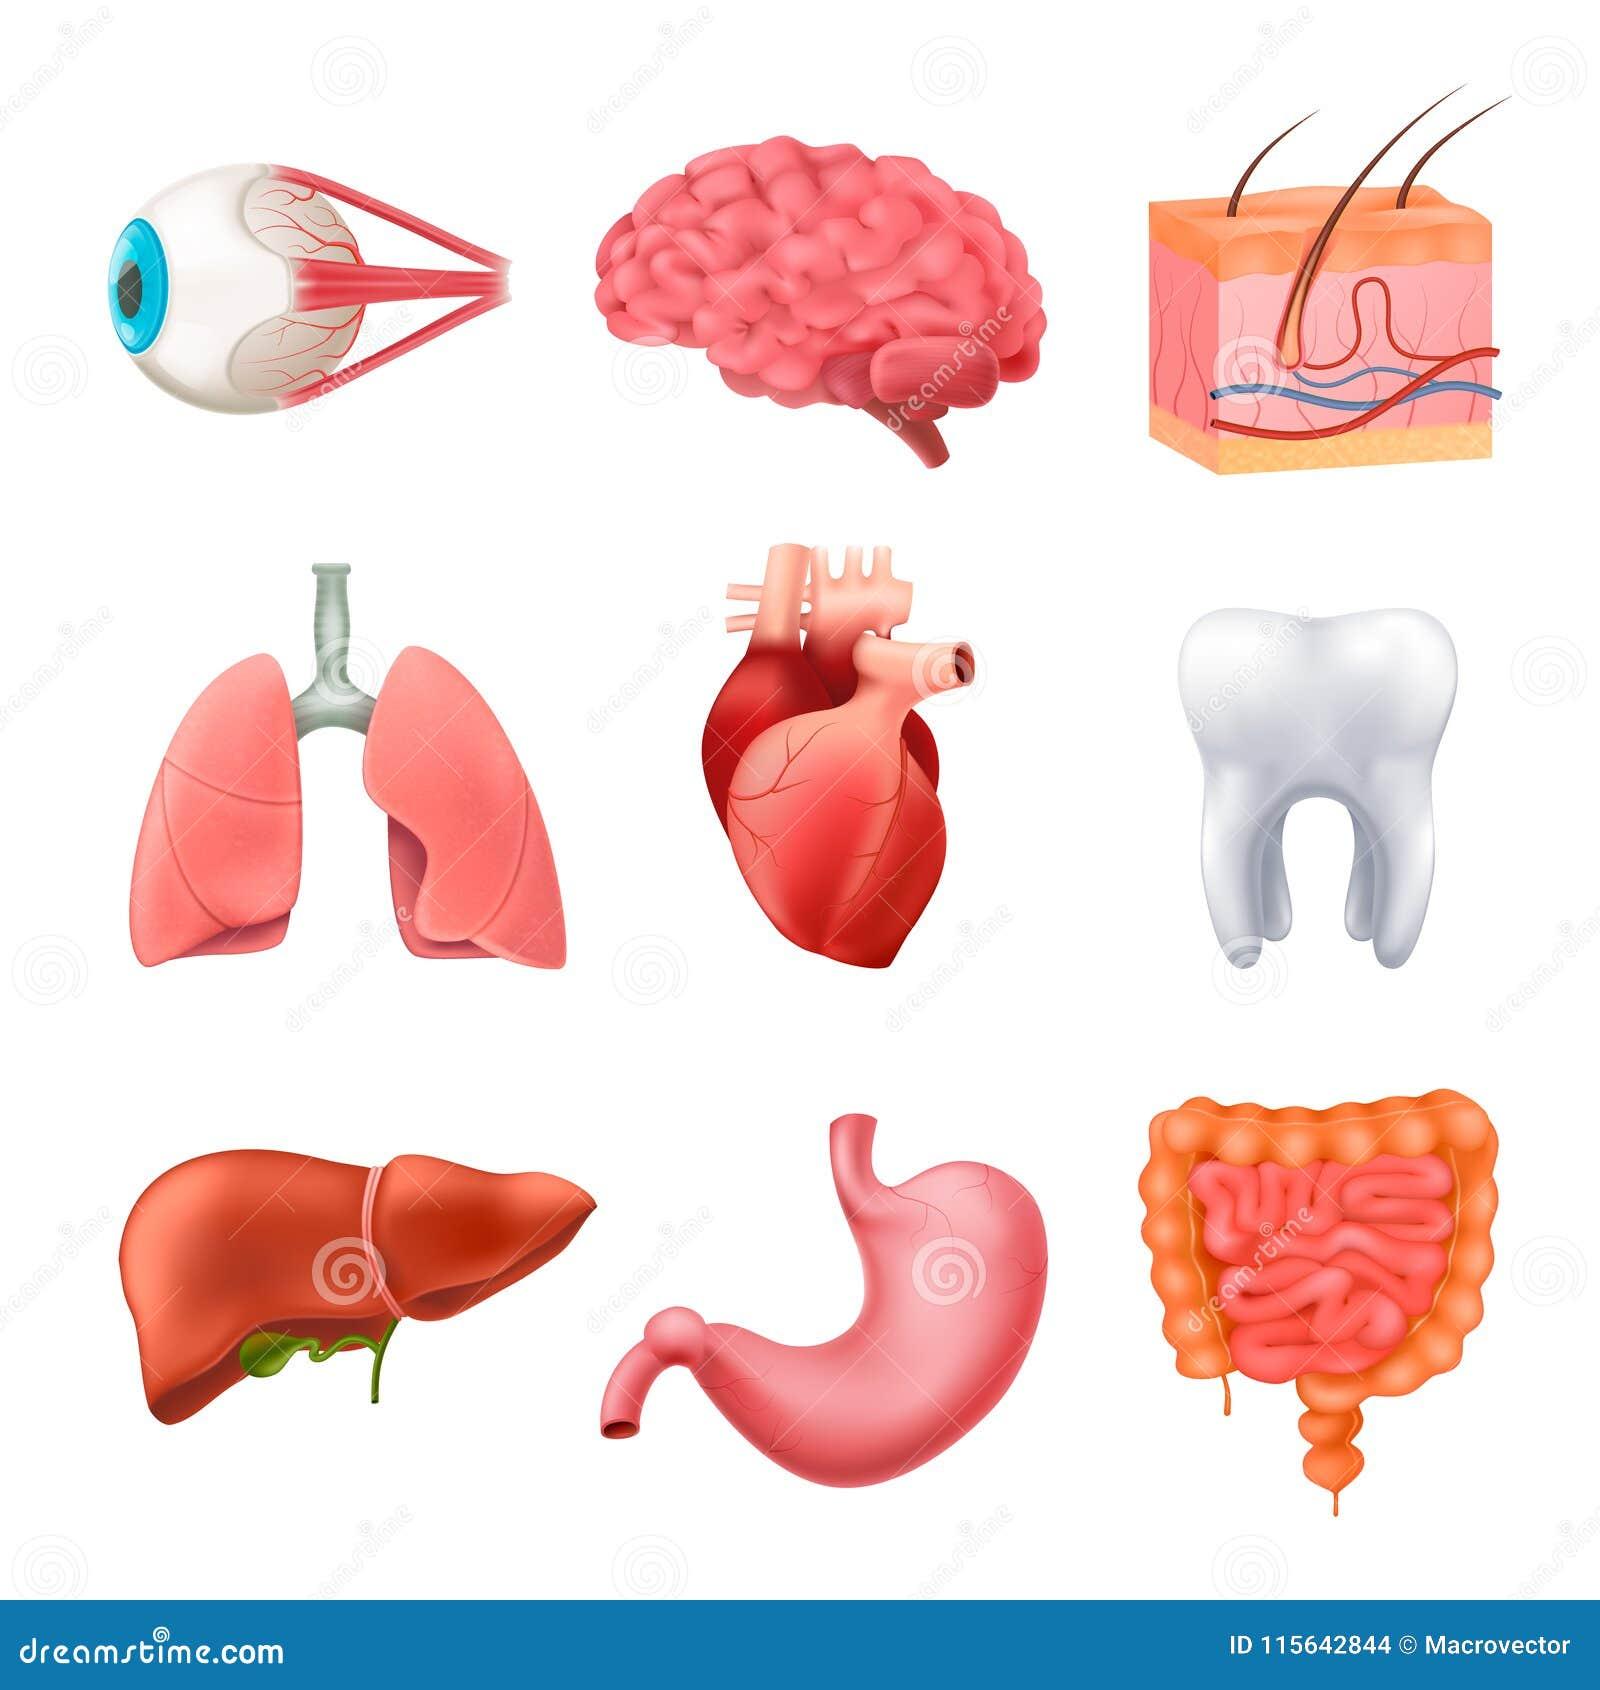 Human Organs Anatomy Realistic Set Stock Vector - Illustration of ...